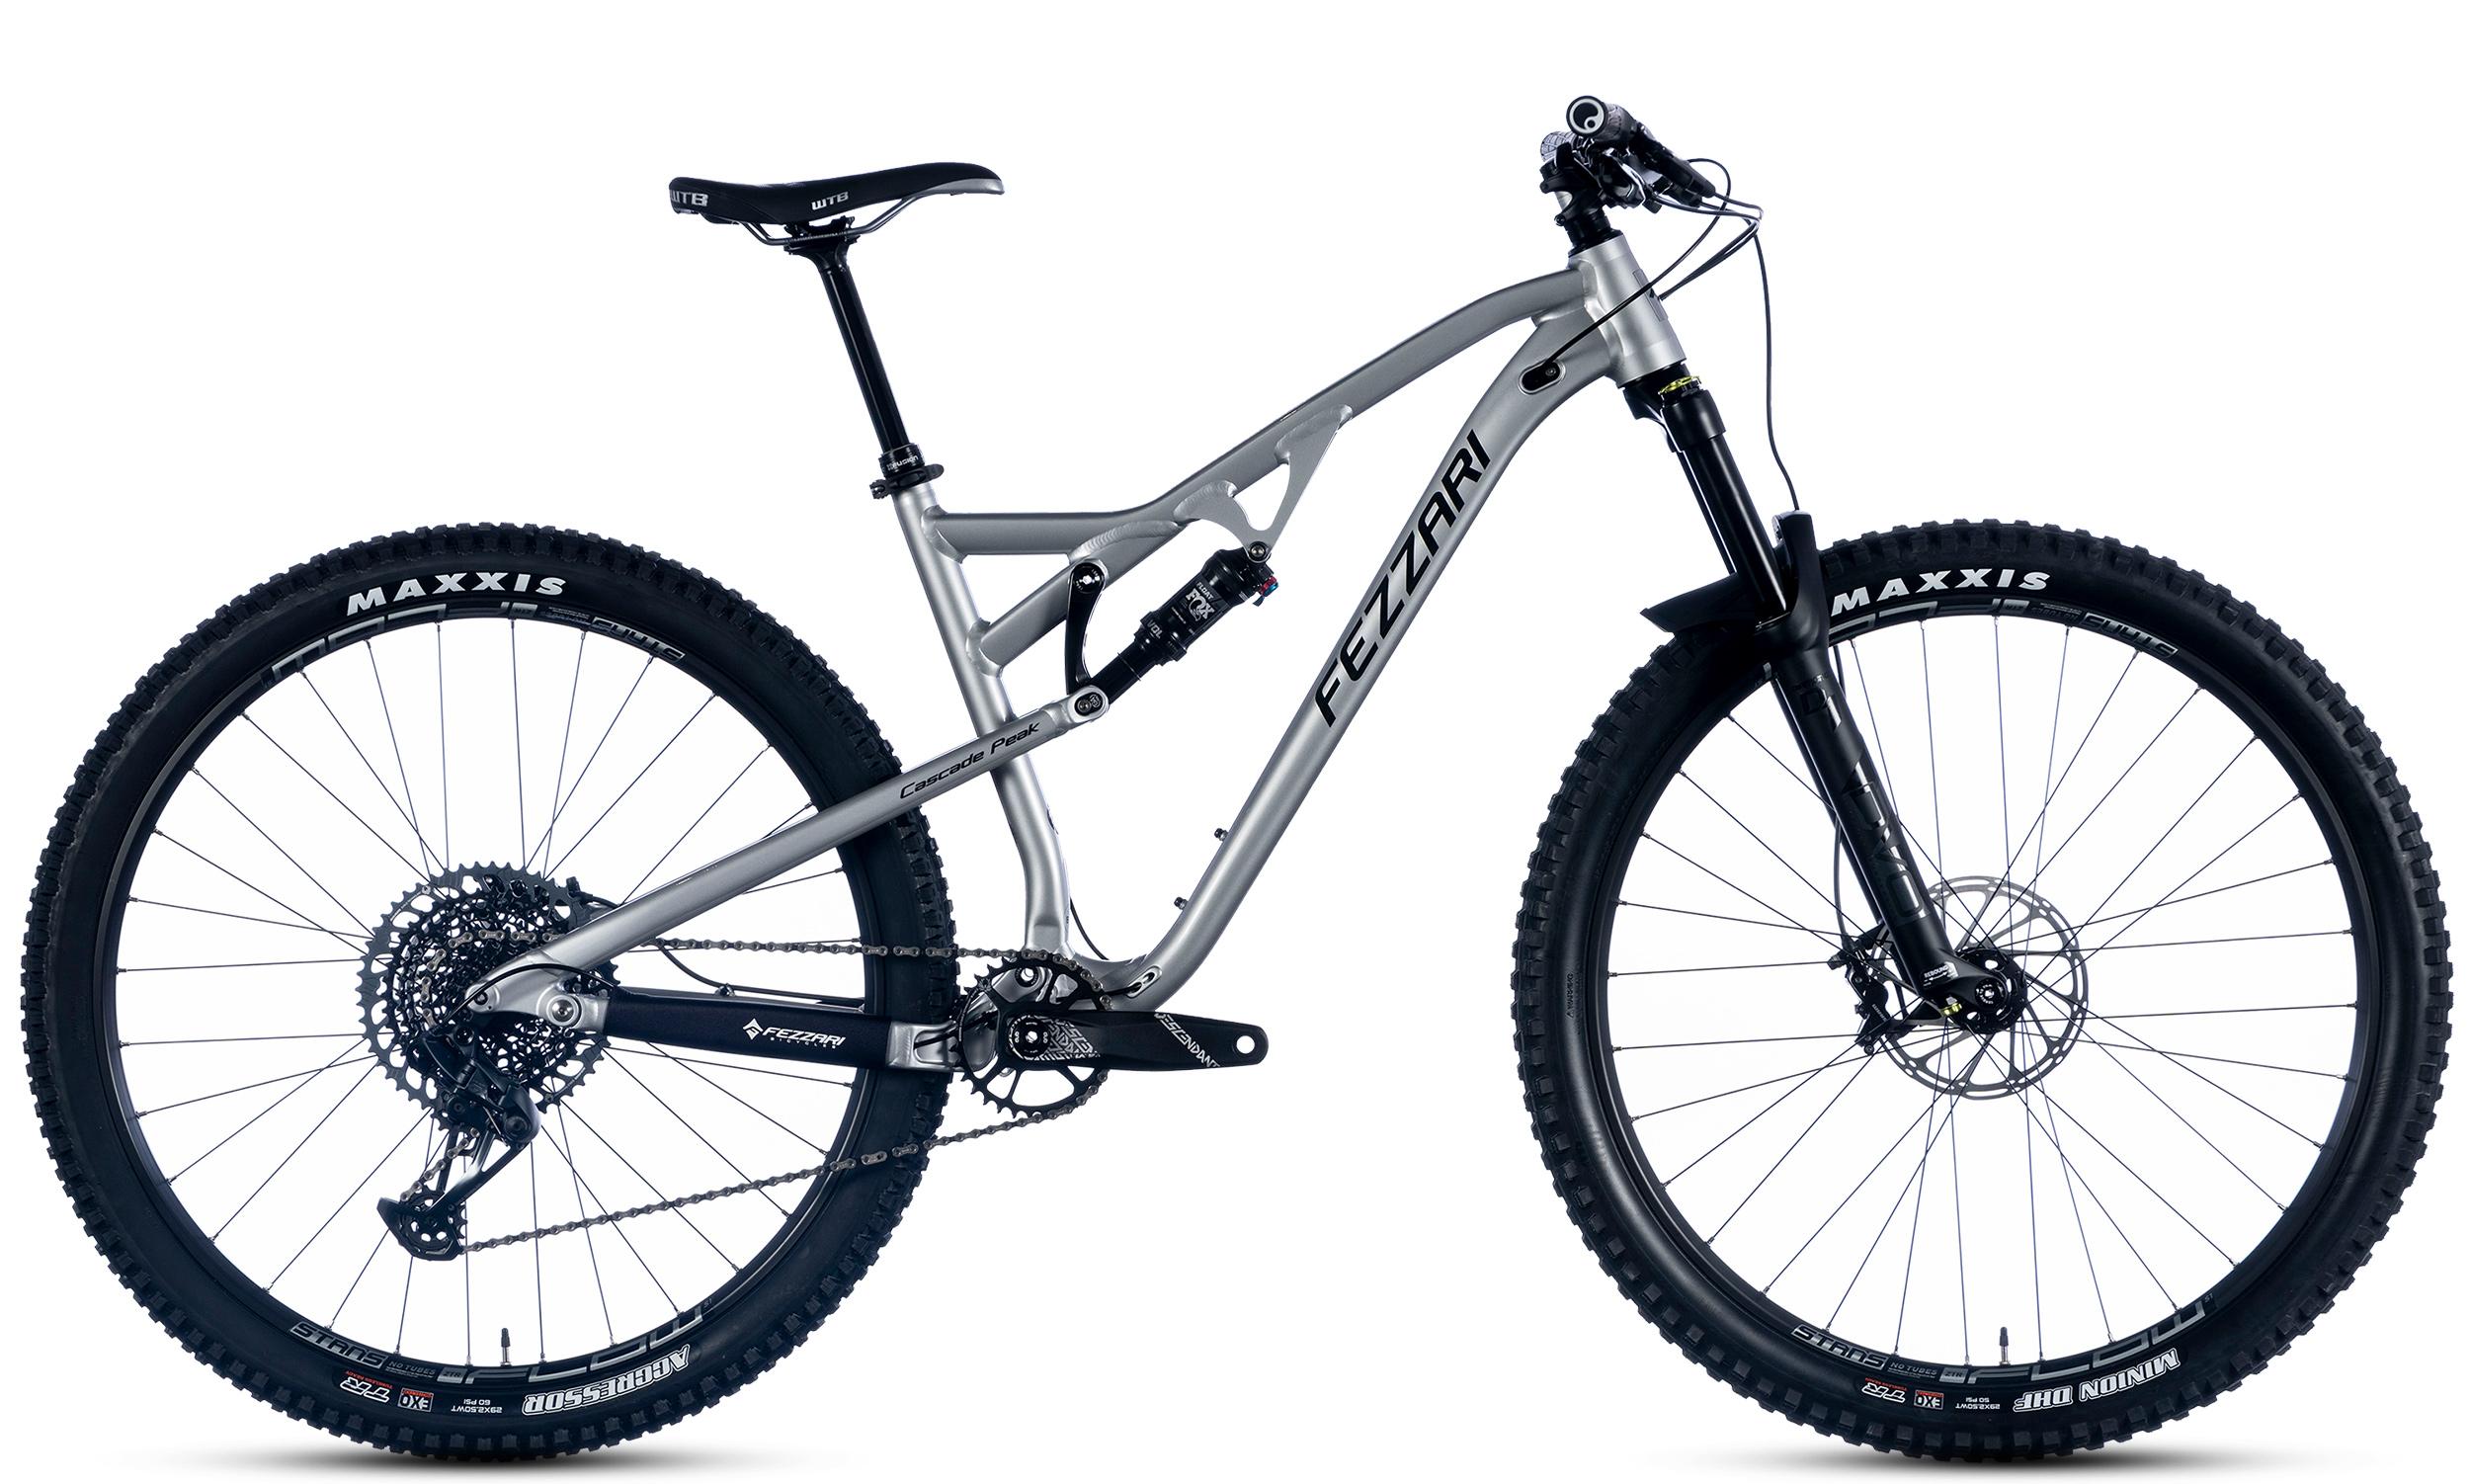 Recommended Bike: Cascade Peak